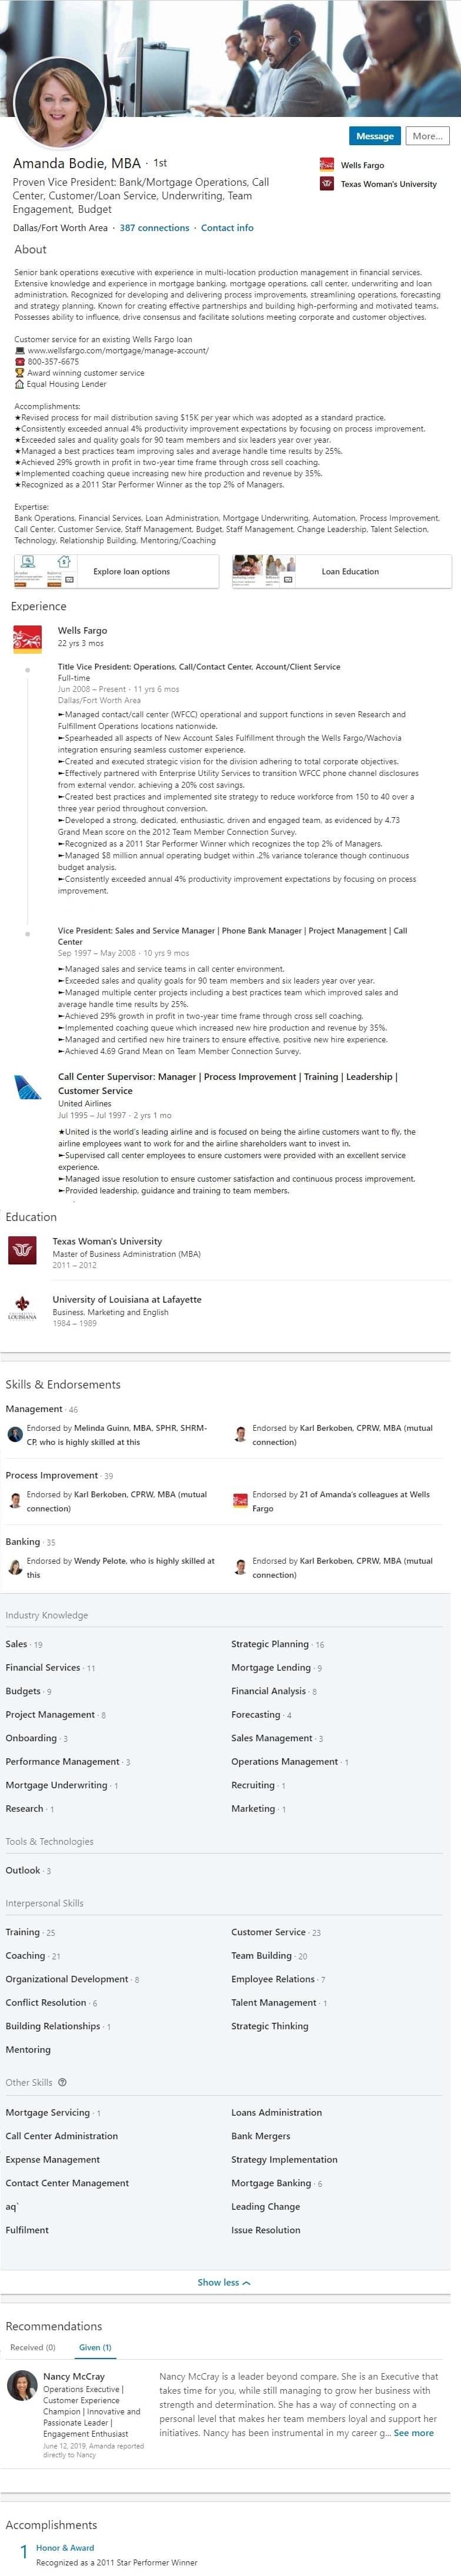 resume service linkedin profile